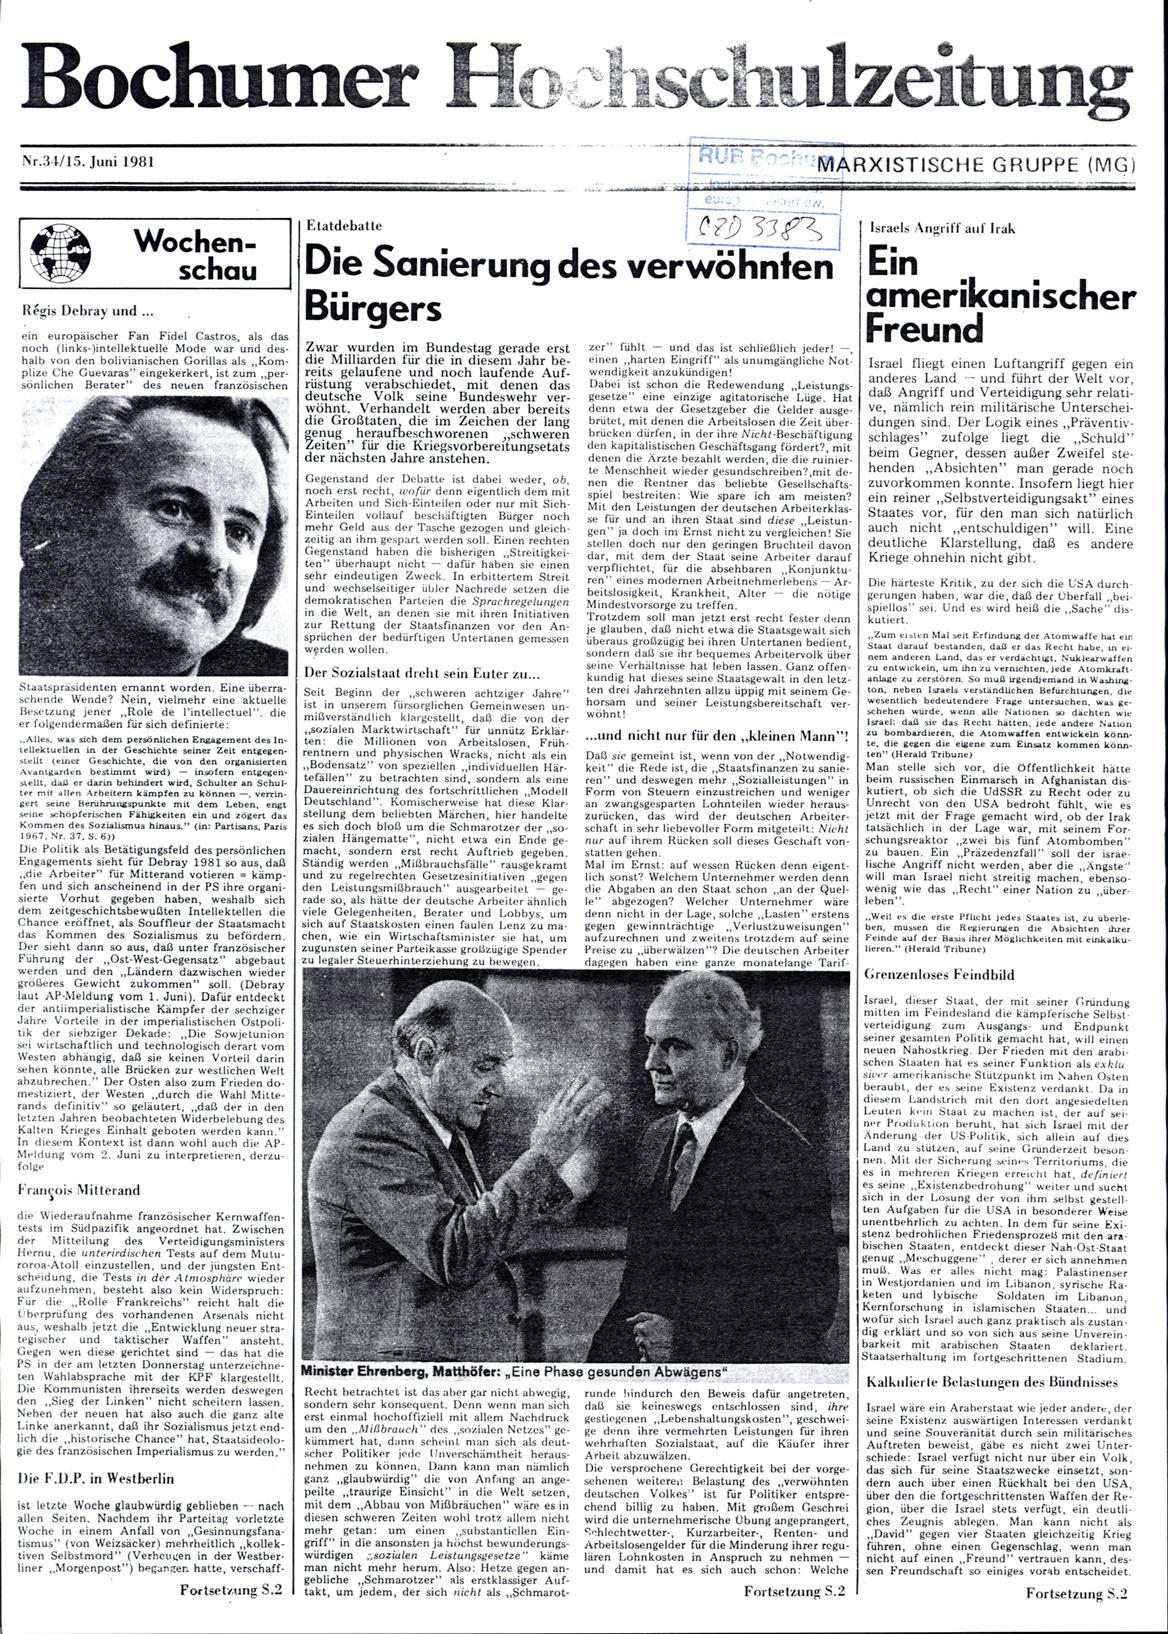 Bochum_BHZ_19810615_034_001